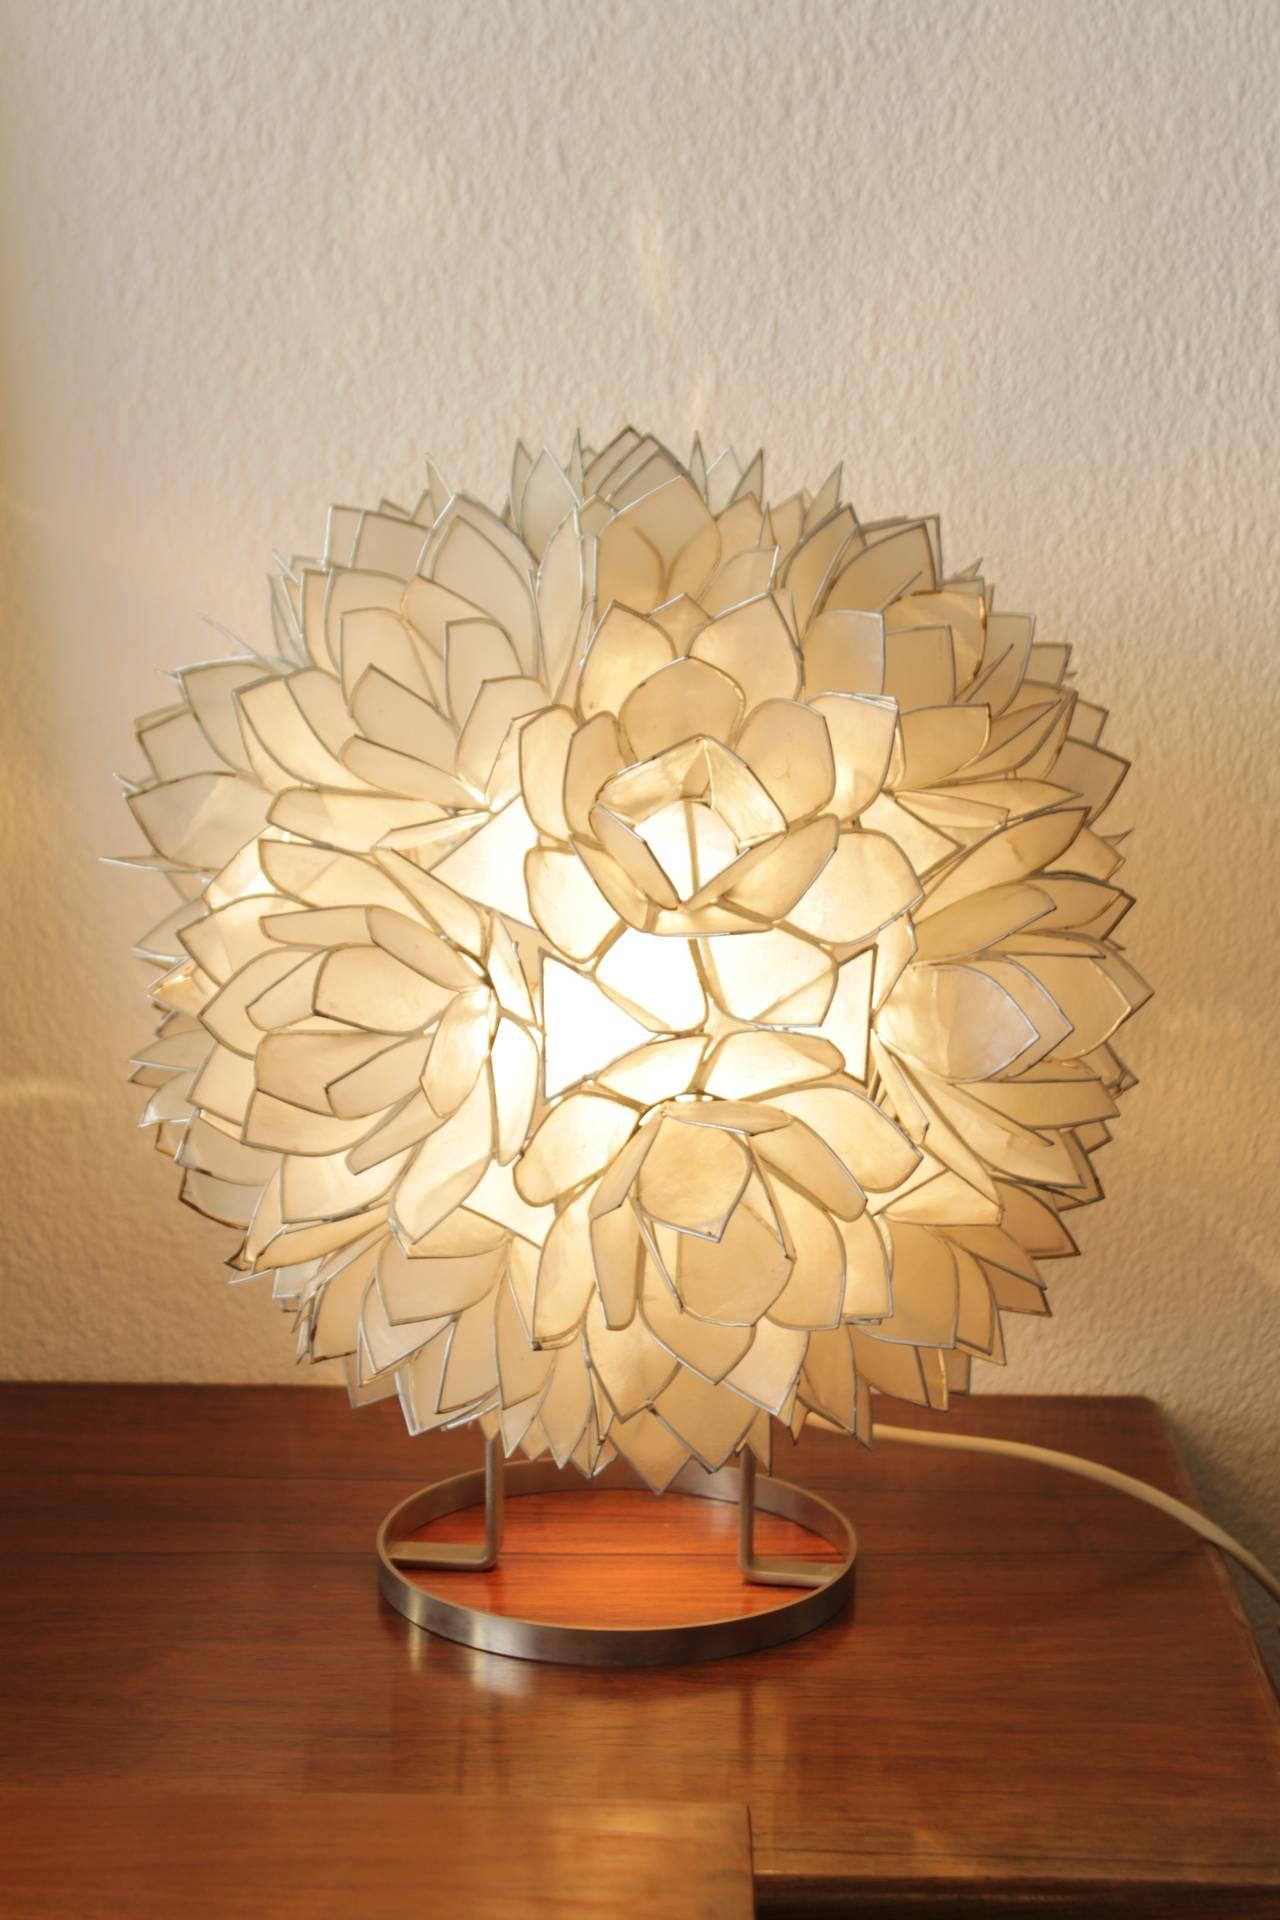 Ordinaire 1970u0027s Capiz Shell Table Lamp